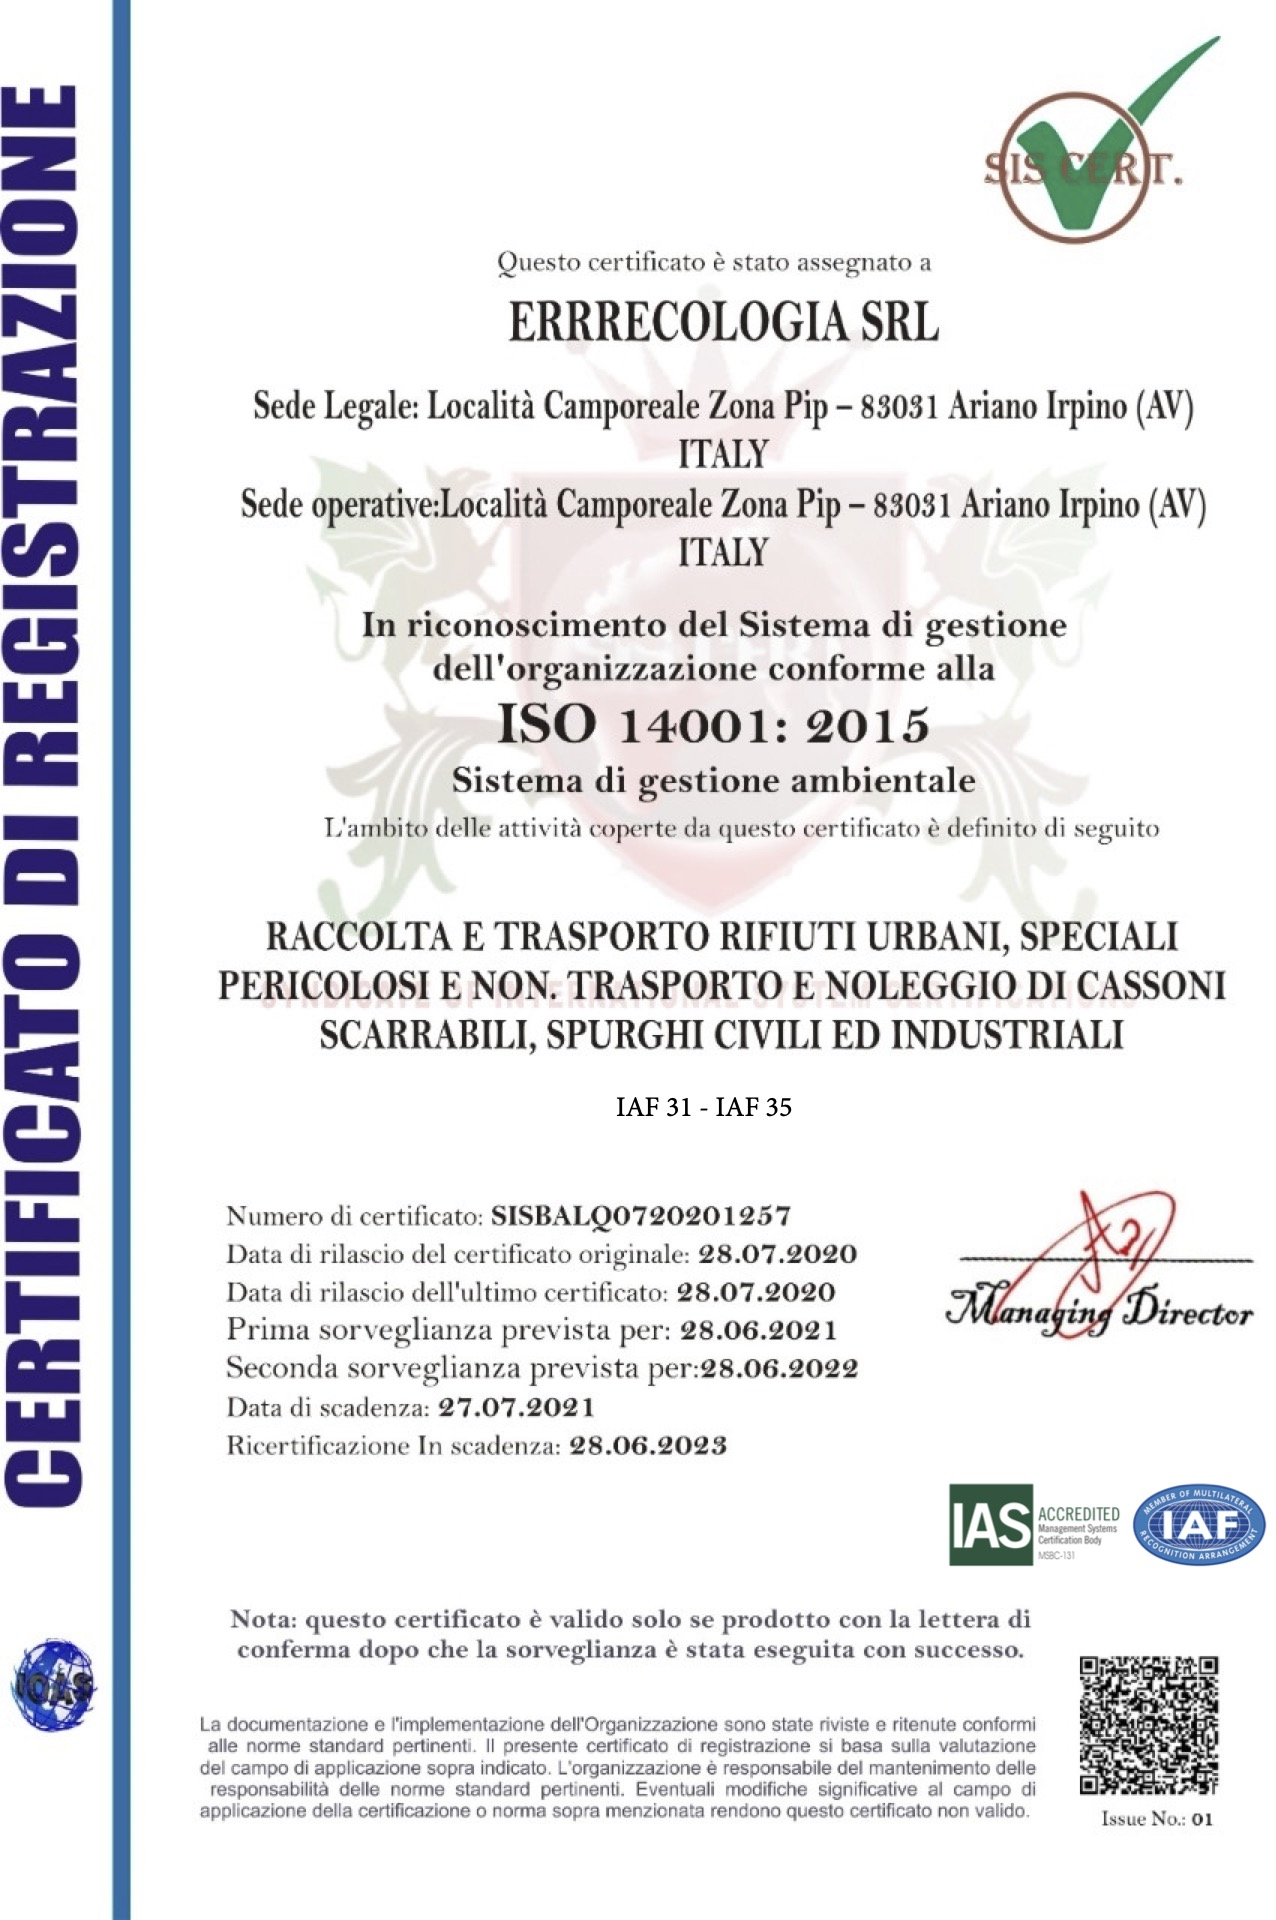 ISO 14001:2015 - Errecologia